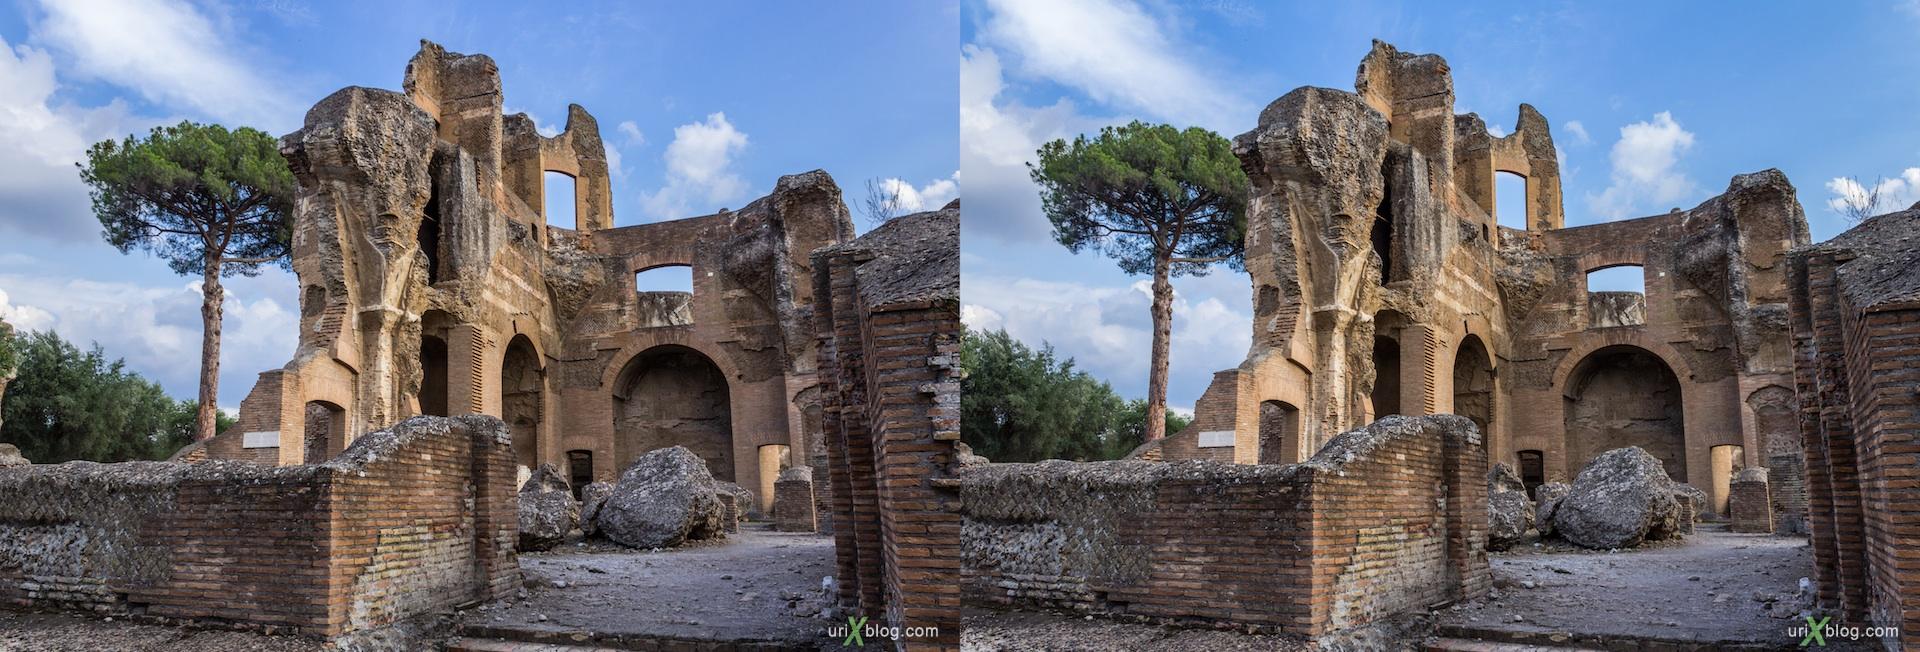 2012, Villa Adriana, Italy, Tivoli, Ancient Rome, 3D, stereo pair, cross-eyed, crossview, cross view stereo pair